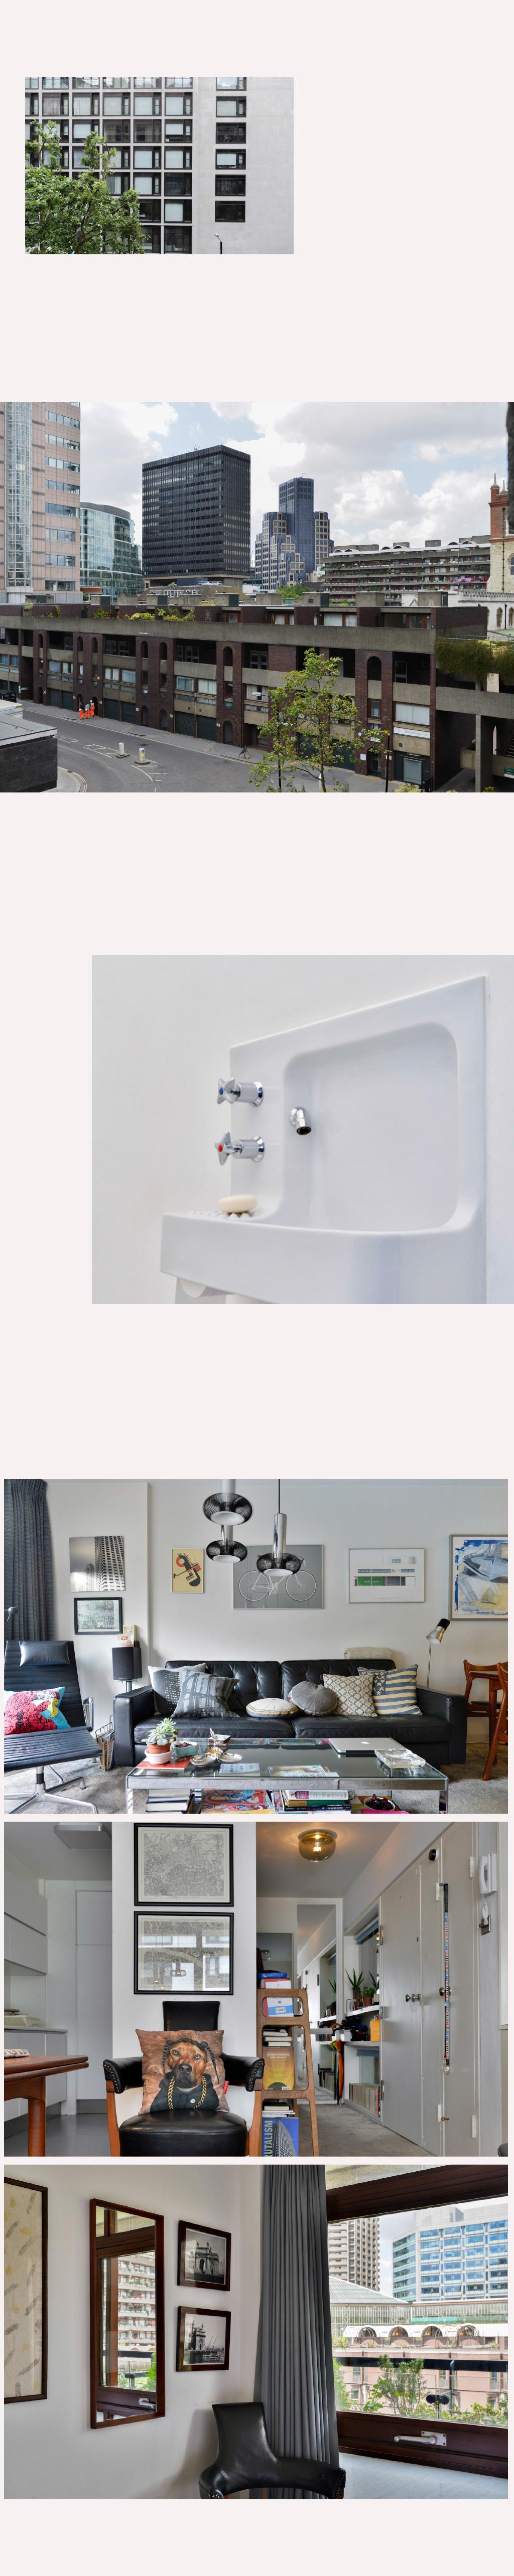 Barbicanlondon harry clark interior design for Innenarchitektur 60er